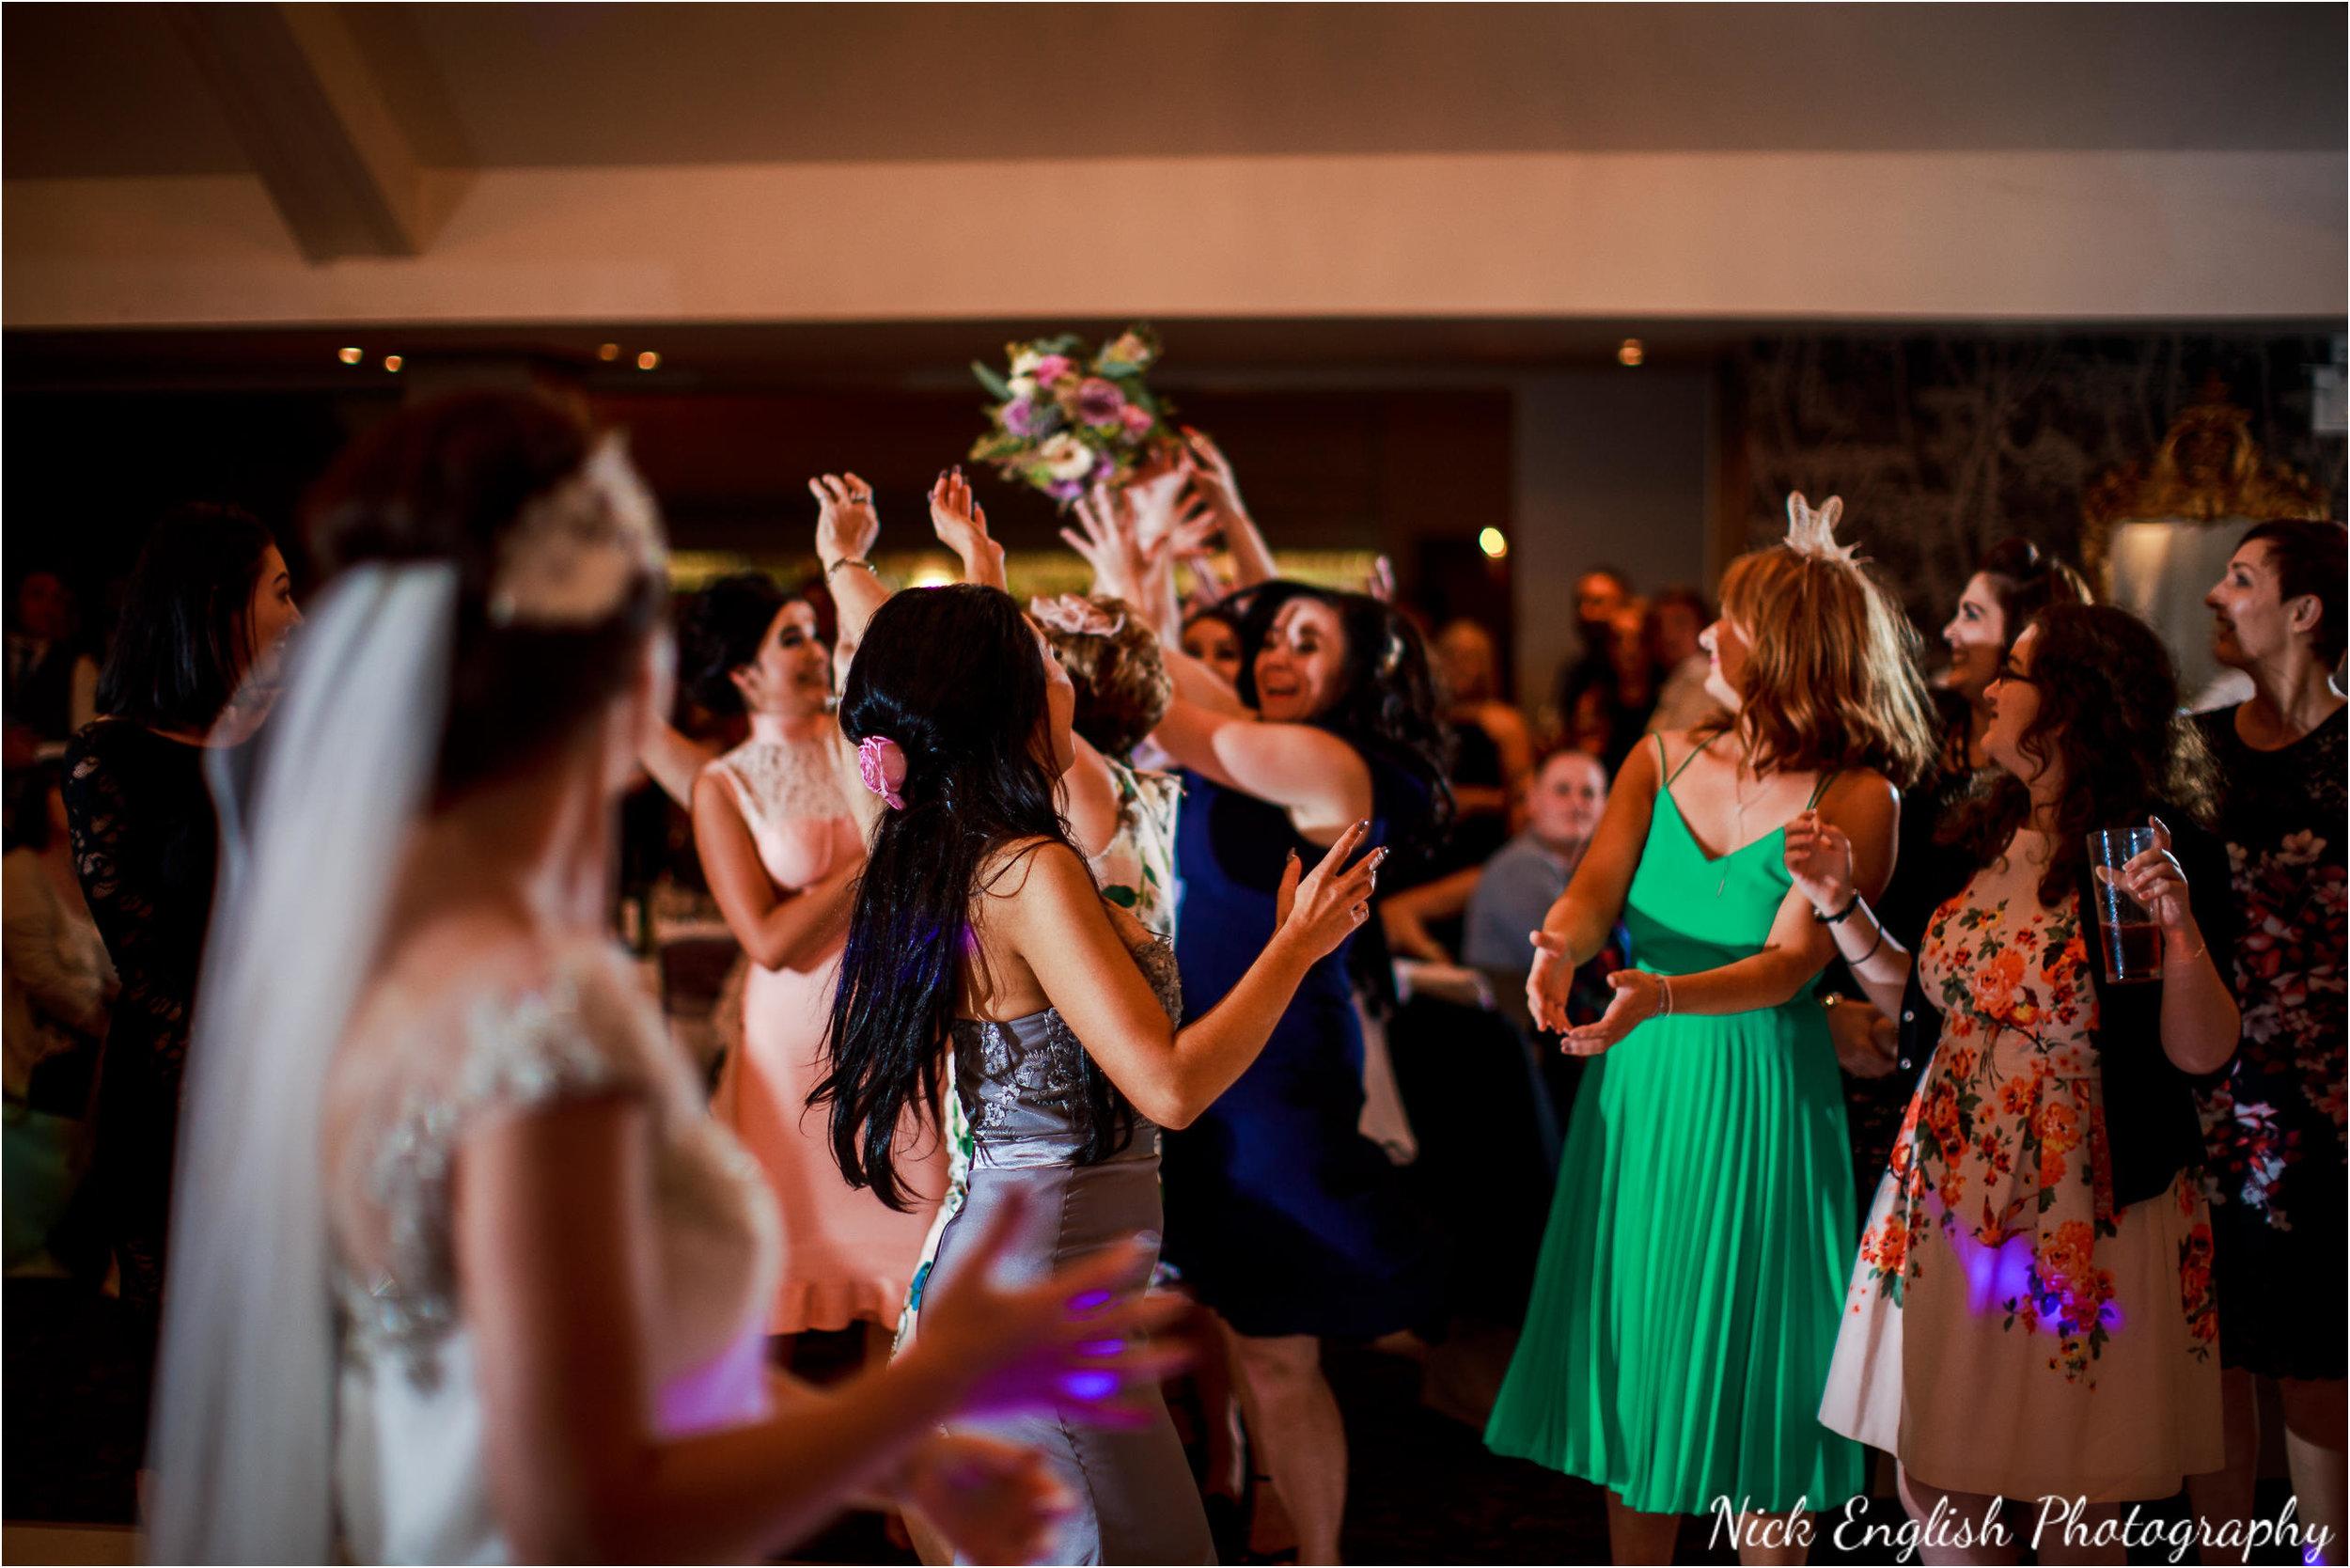 Stacey-Ash-Wedding-Photographs-Stanley-House-Preston-Lancashire-244.jpg